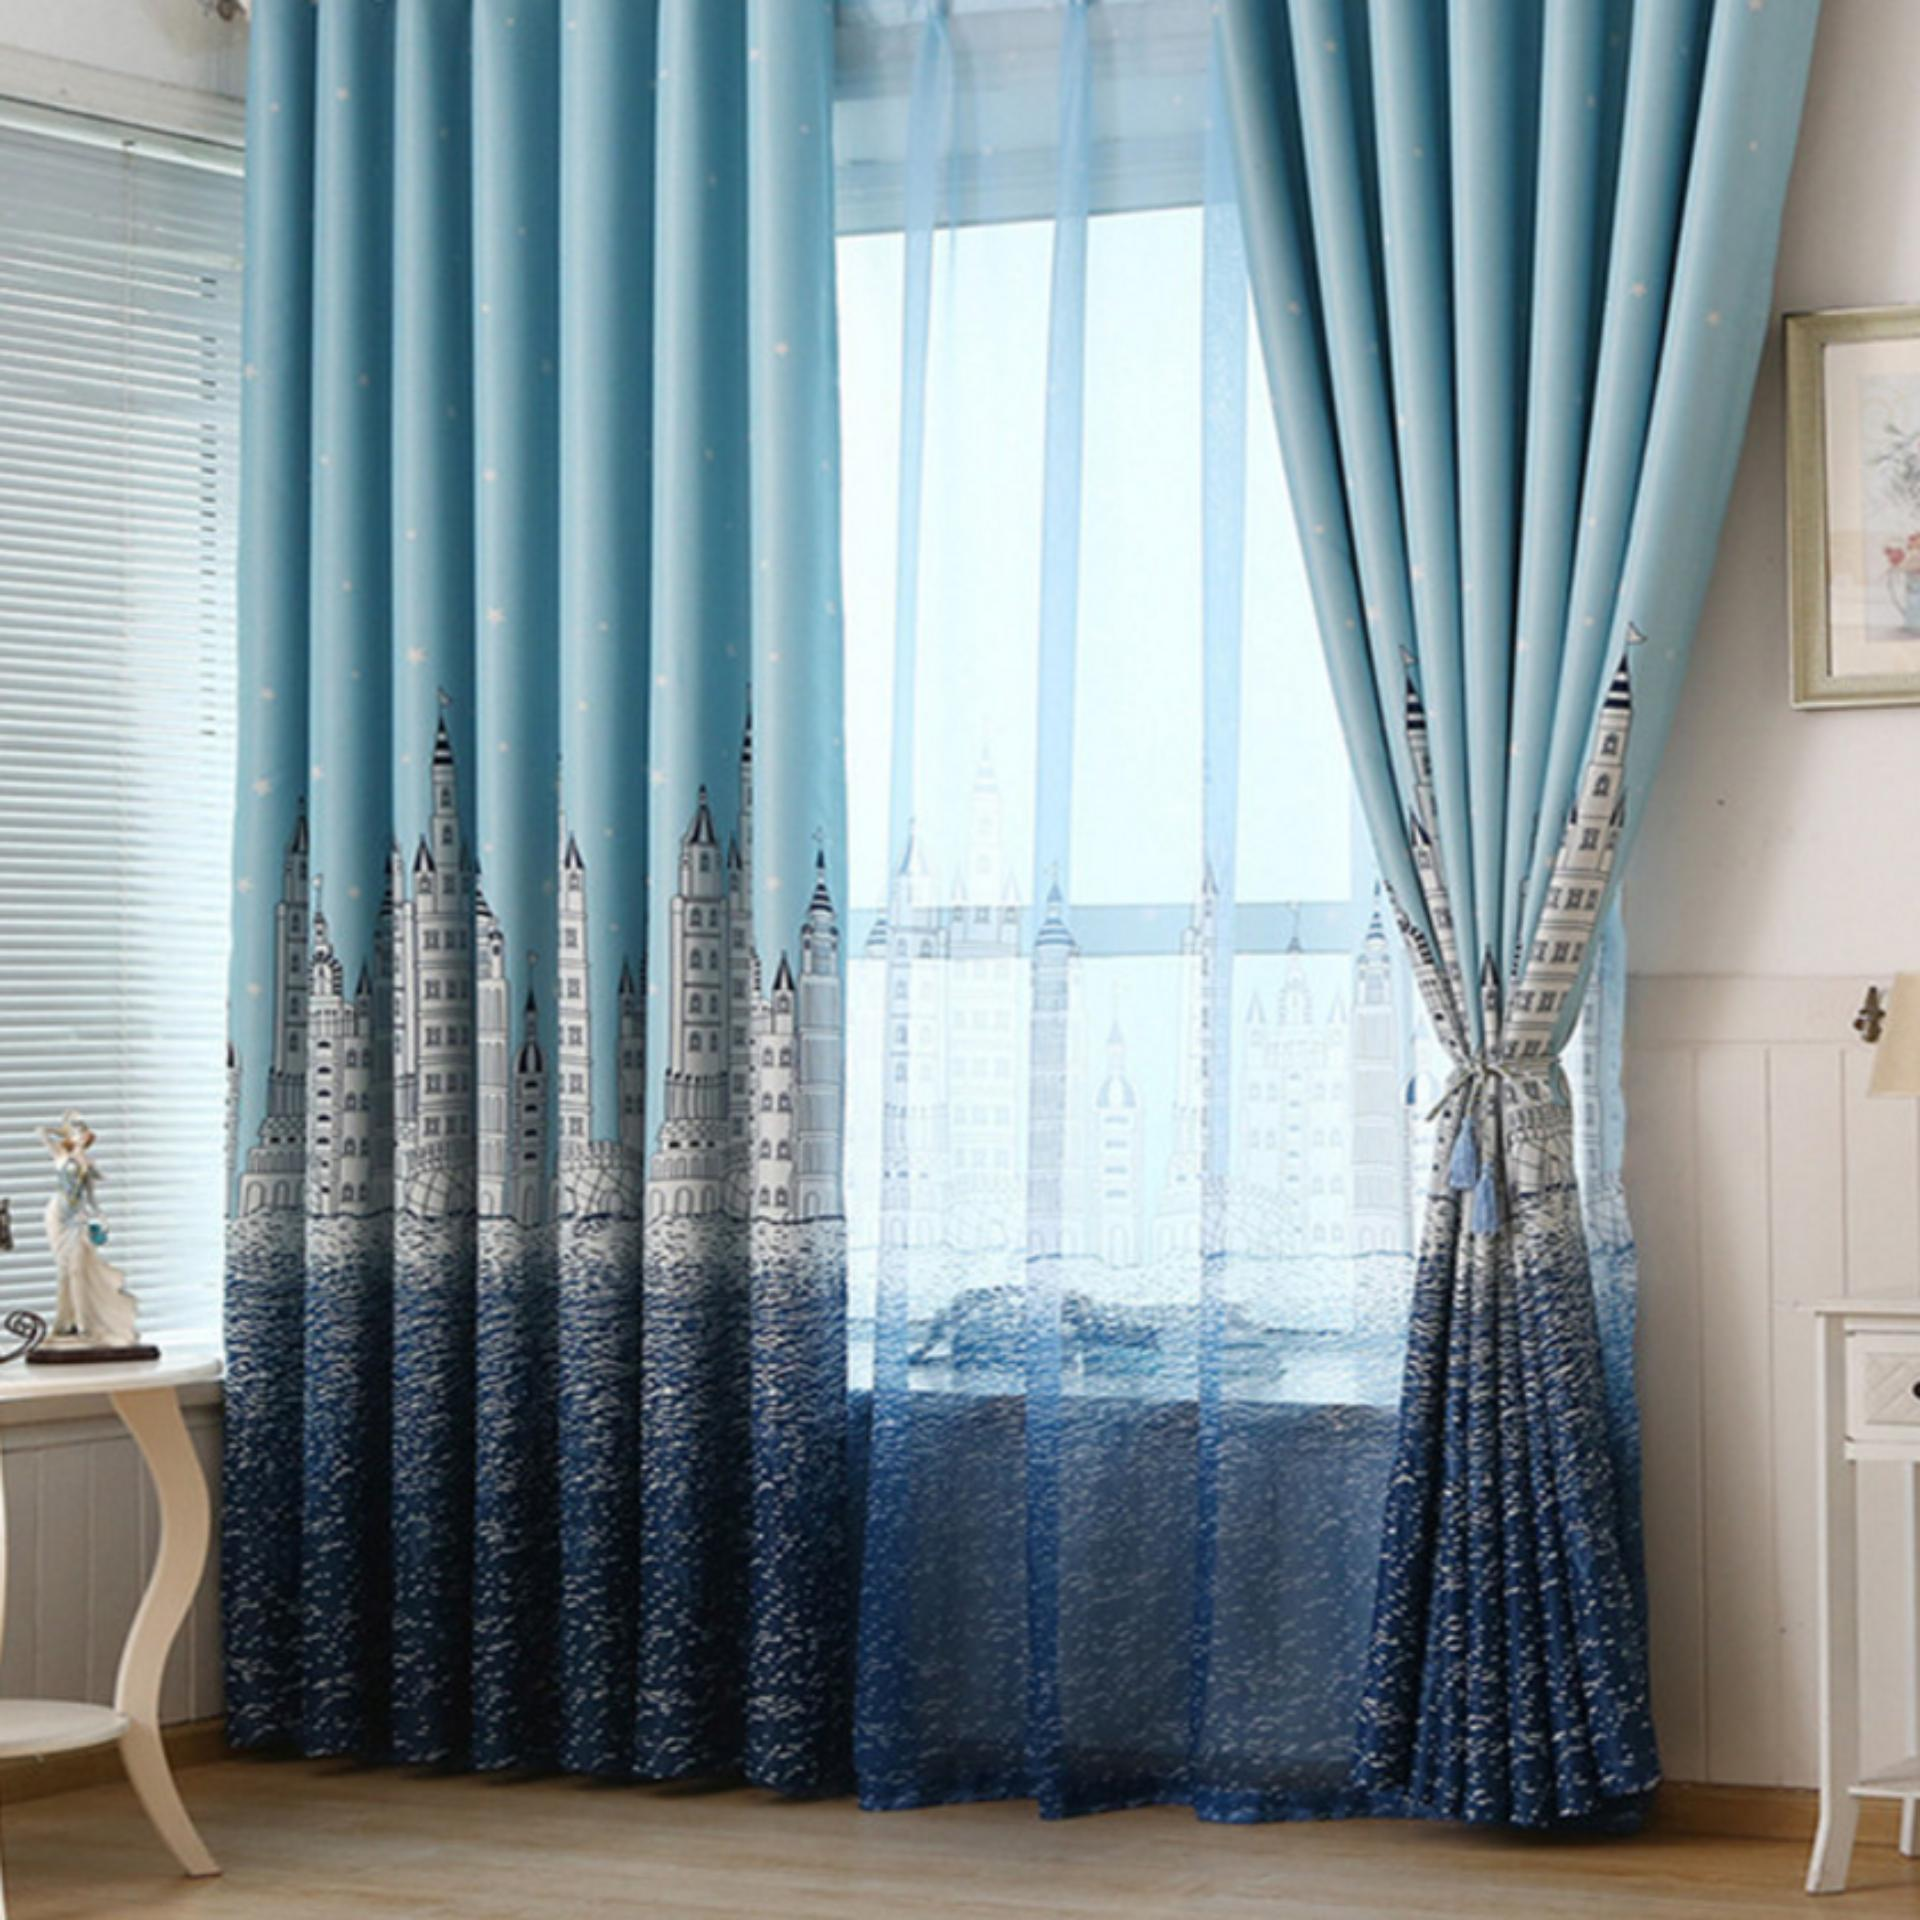 [OrangeHome] British Country Living Room Bedroom Balcony Panel Divider Curtains Drape Sky Blue 140*270 (hook free) (1 pcs) - intl